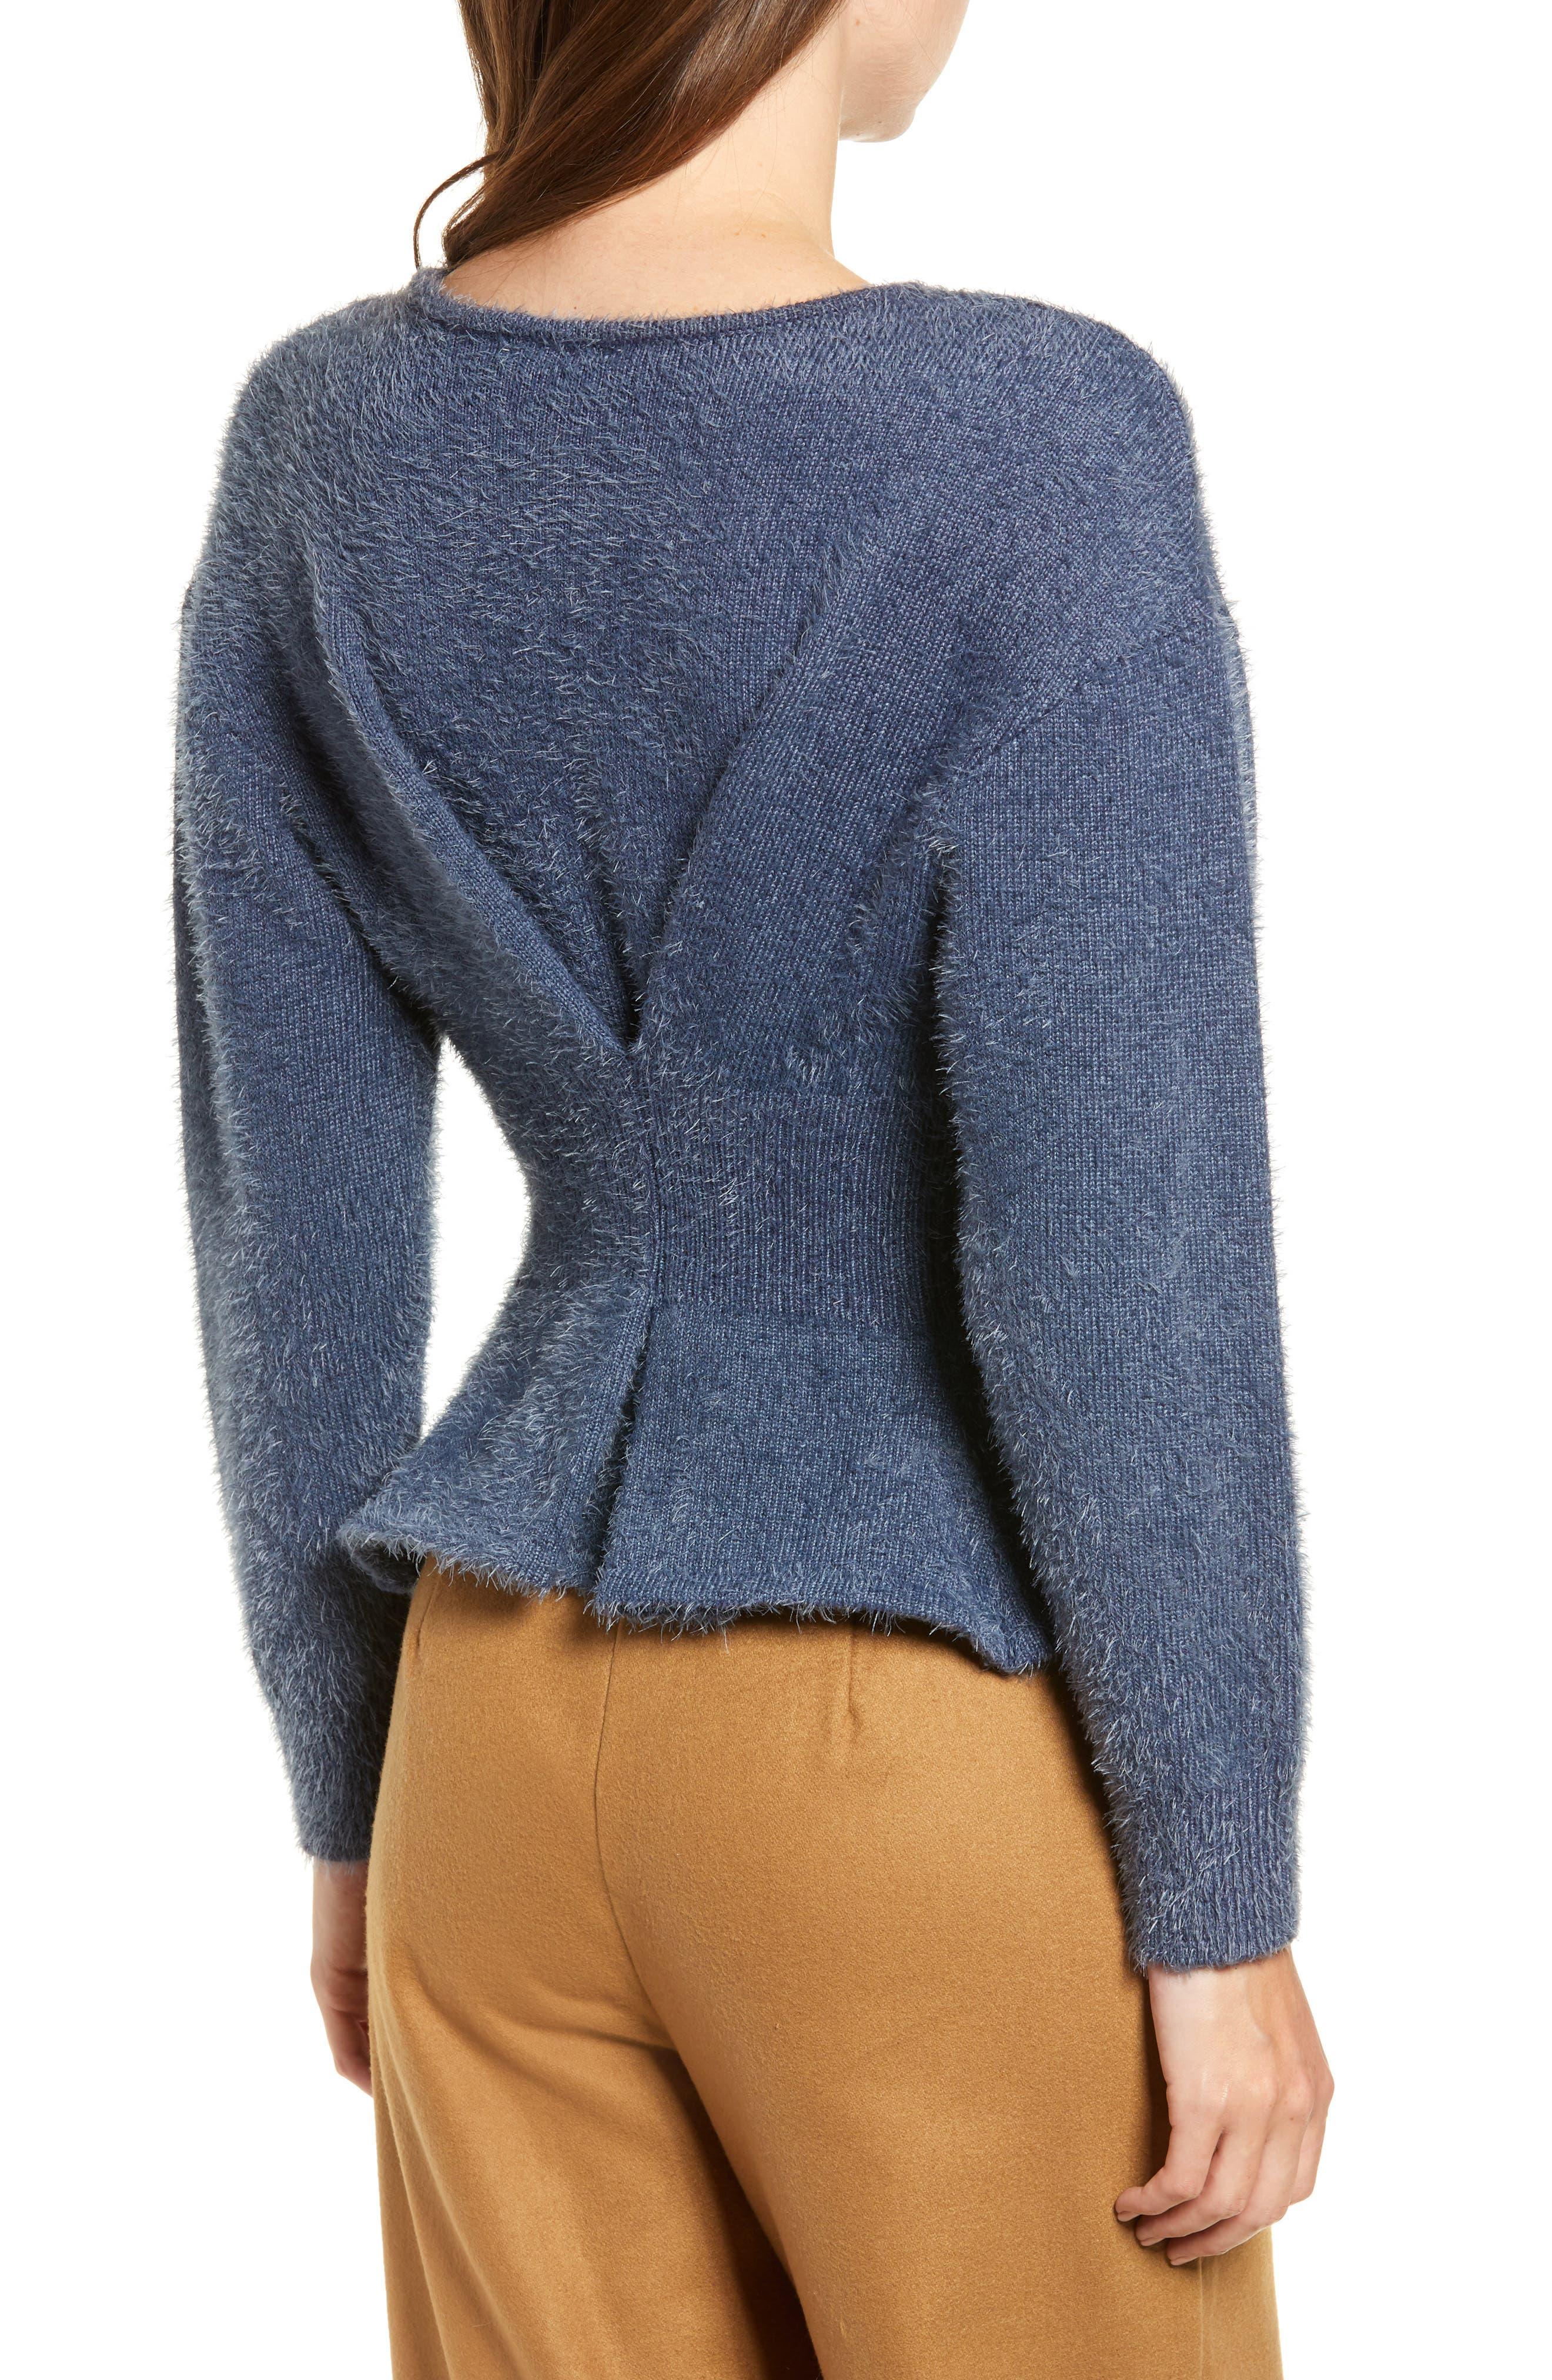 Chriselle Lim Erin Eyelash Sweater,                             Alternate thumbnail 3, color,                             400